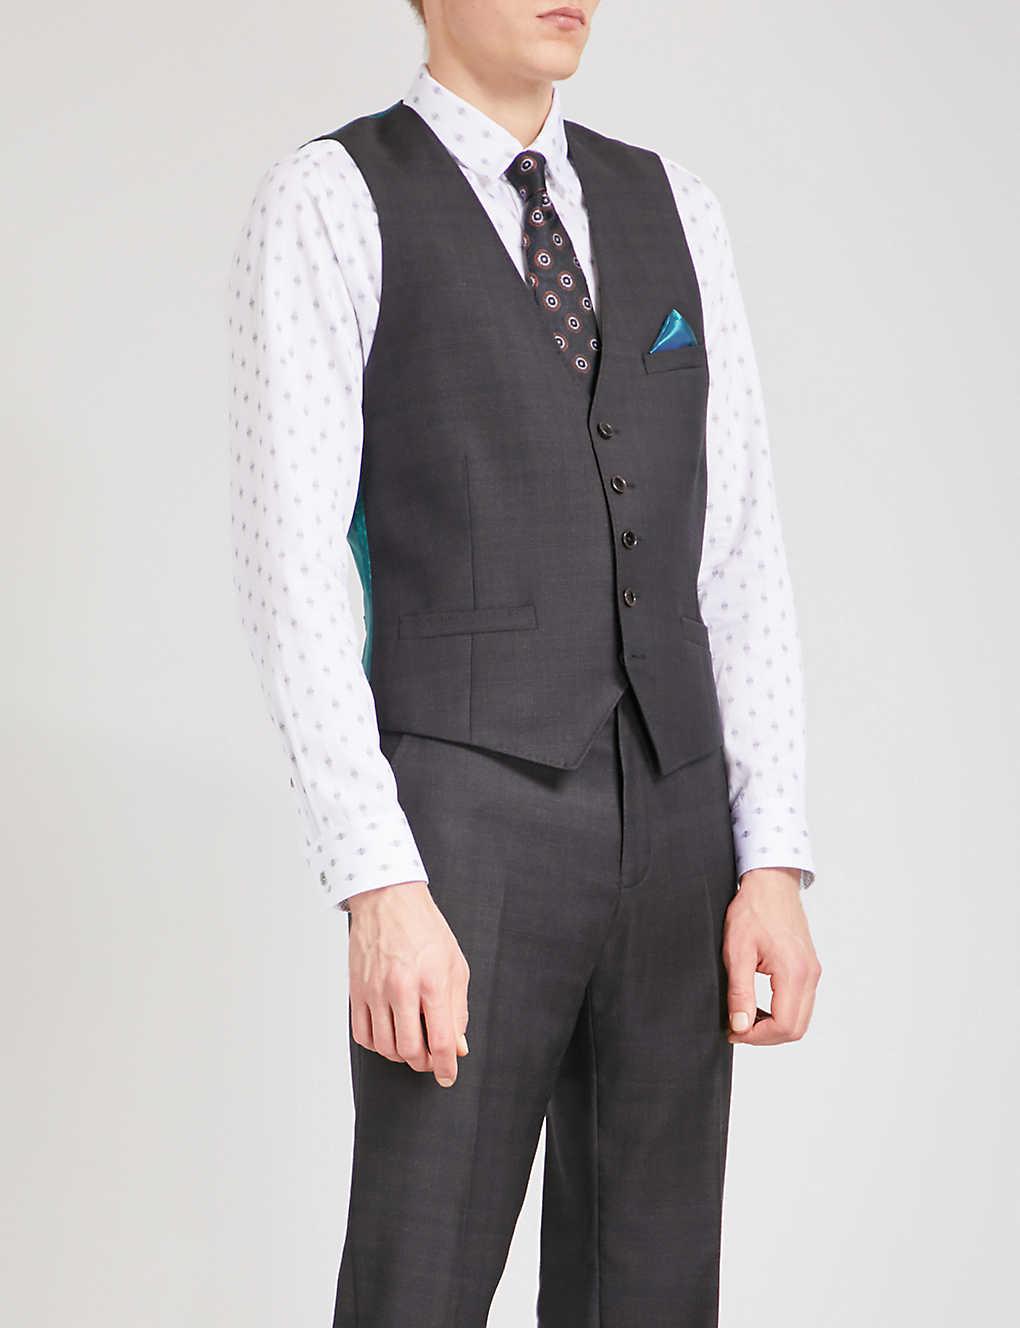 80525b5c4 TED BAKER - Checked and geometric-print wool waistcoat